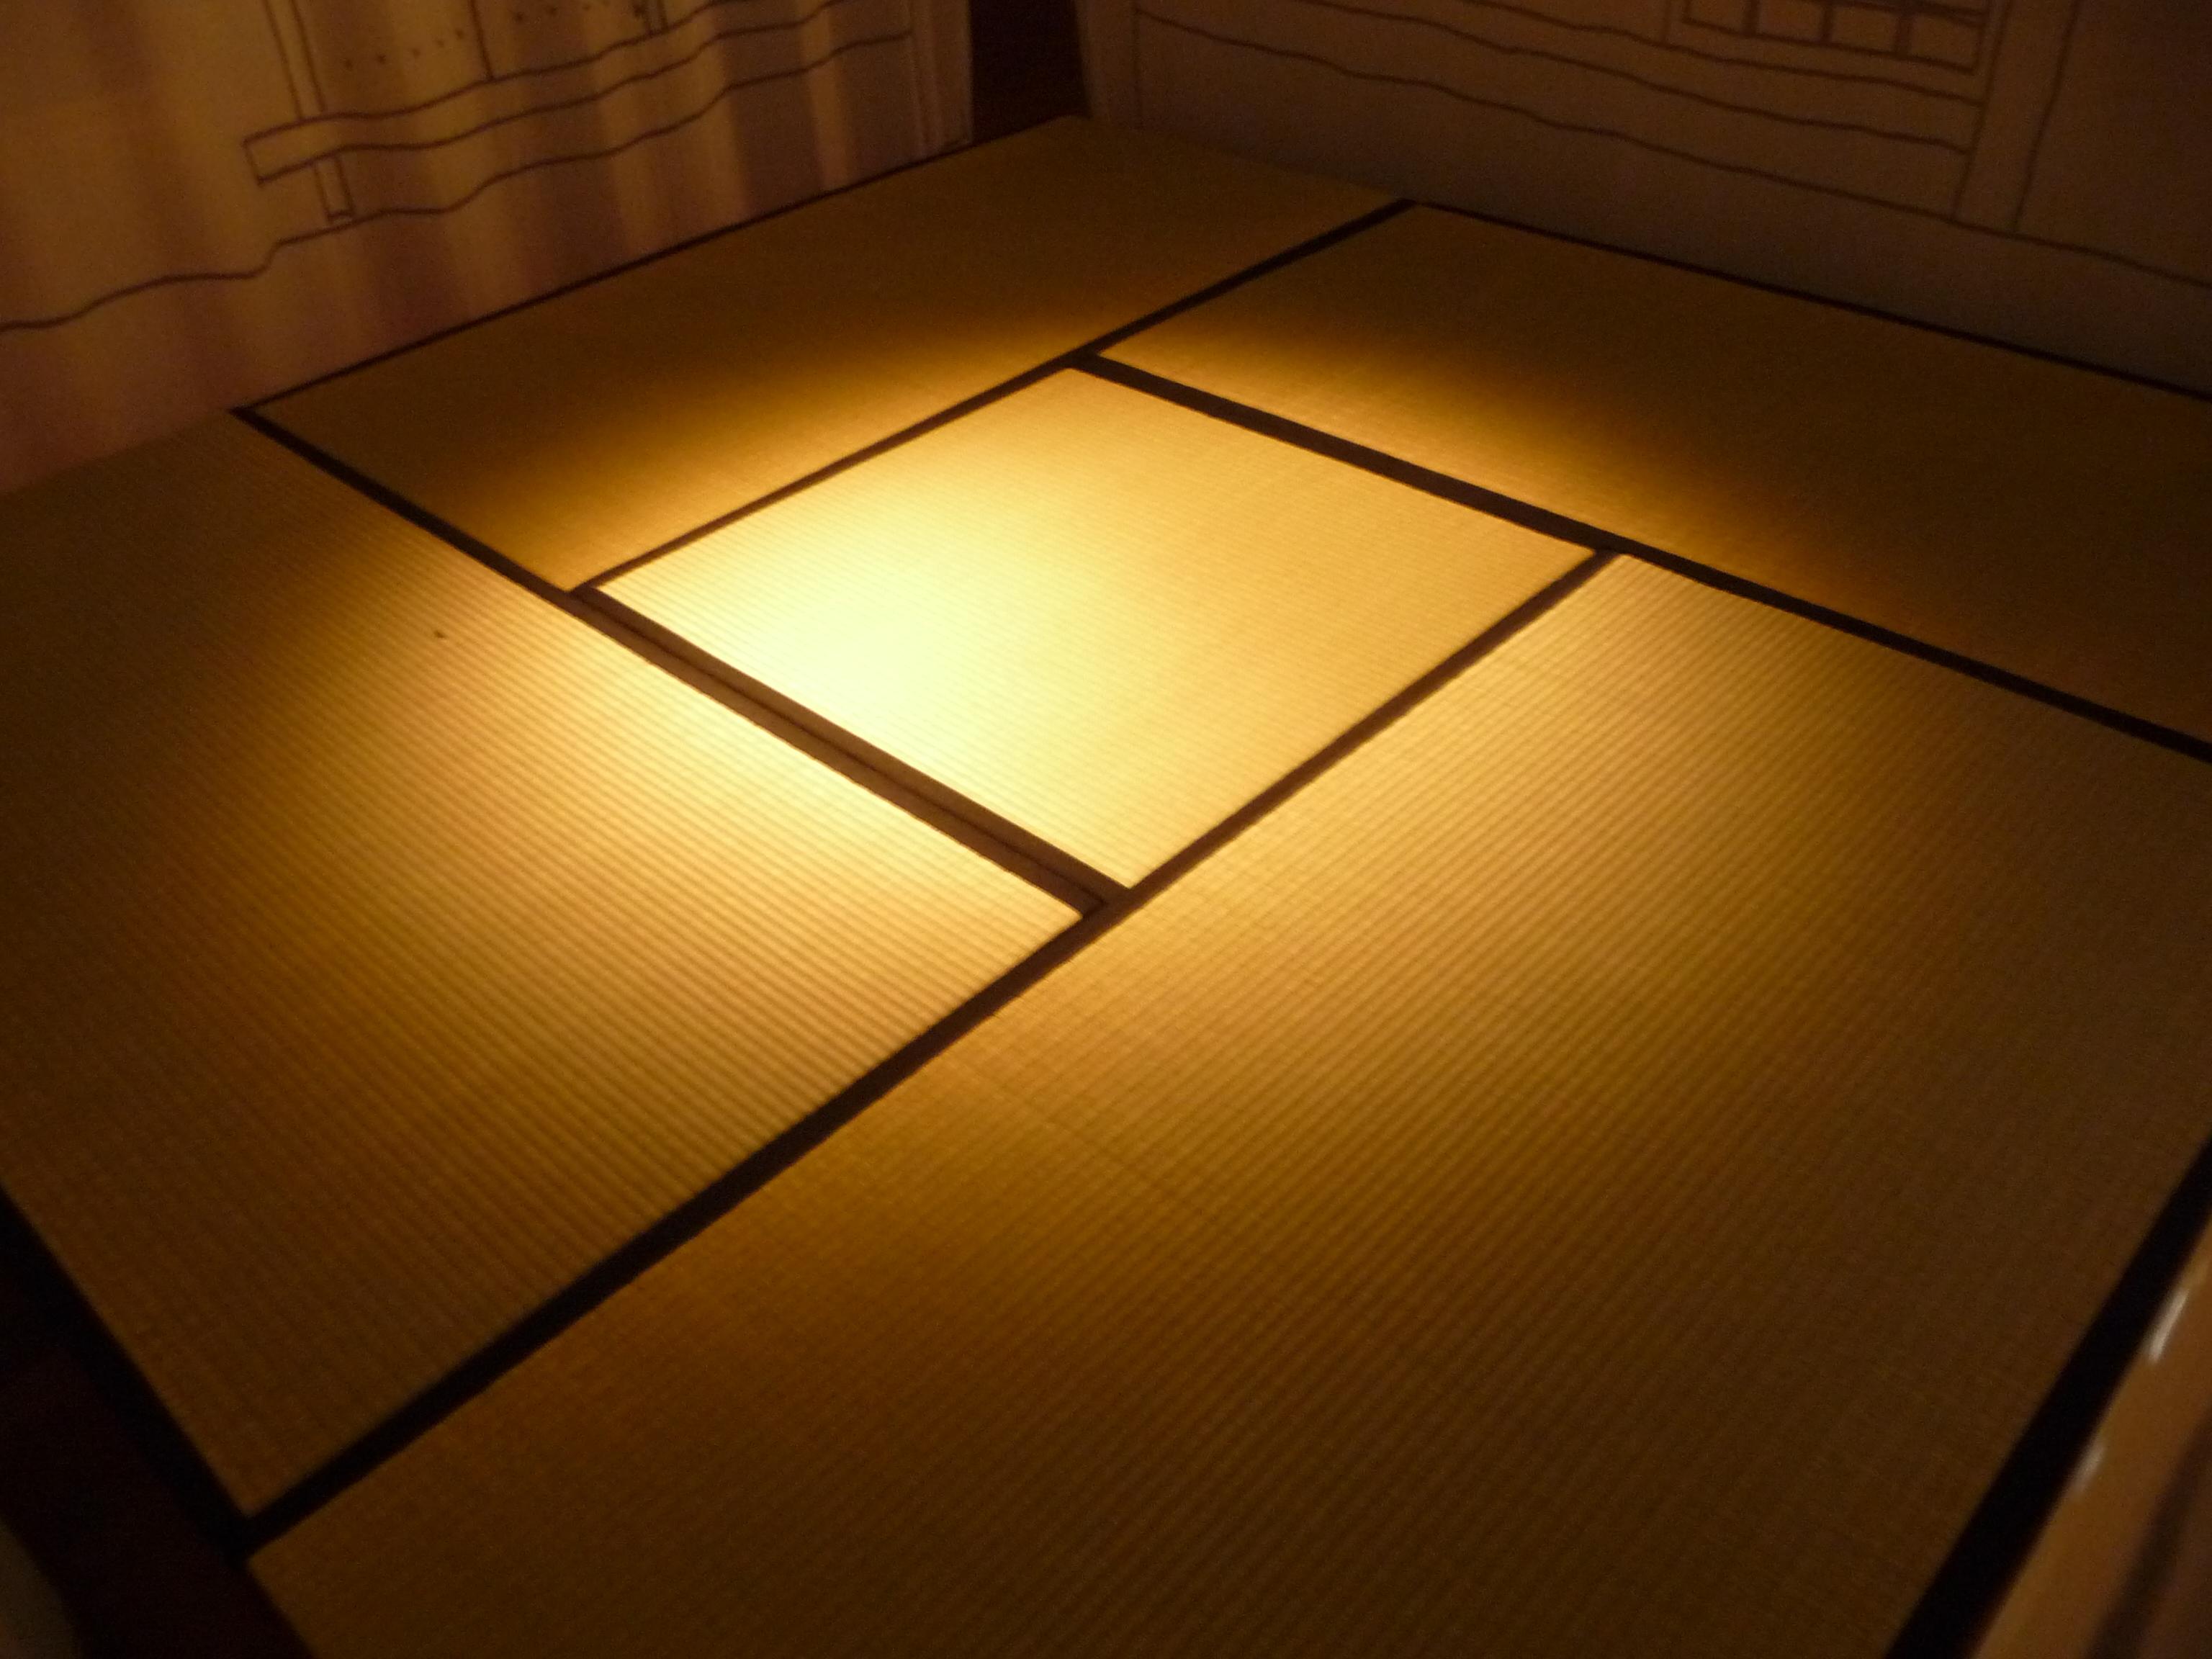 Tatami Matten file tatami matten jpg wikimedia commons